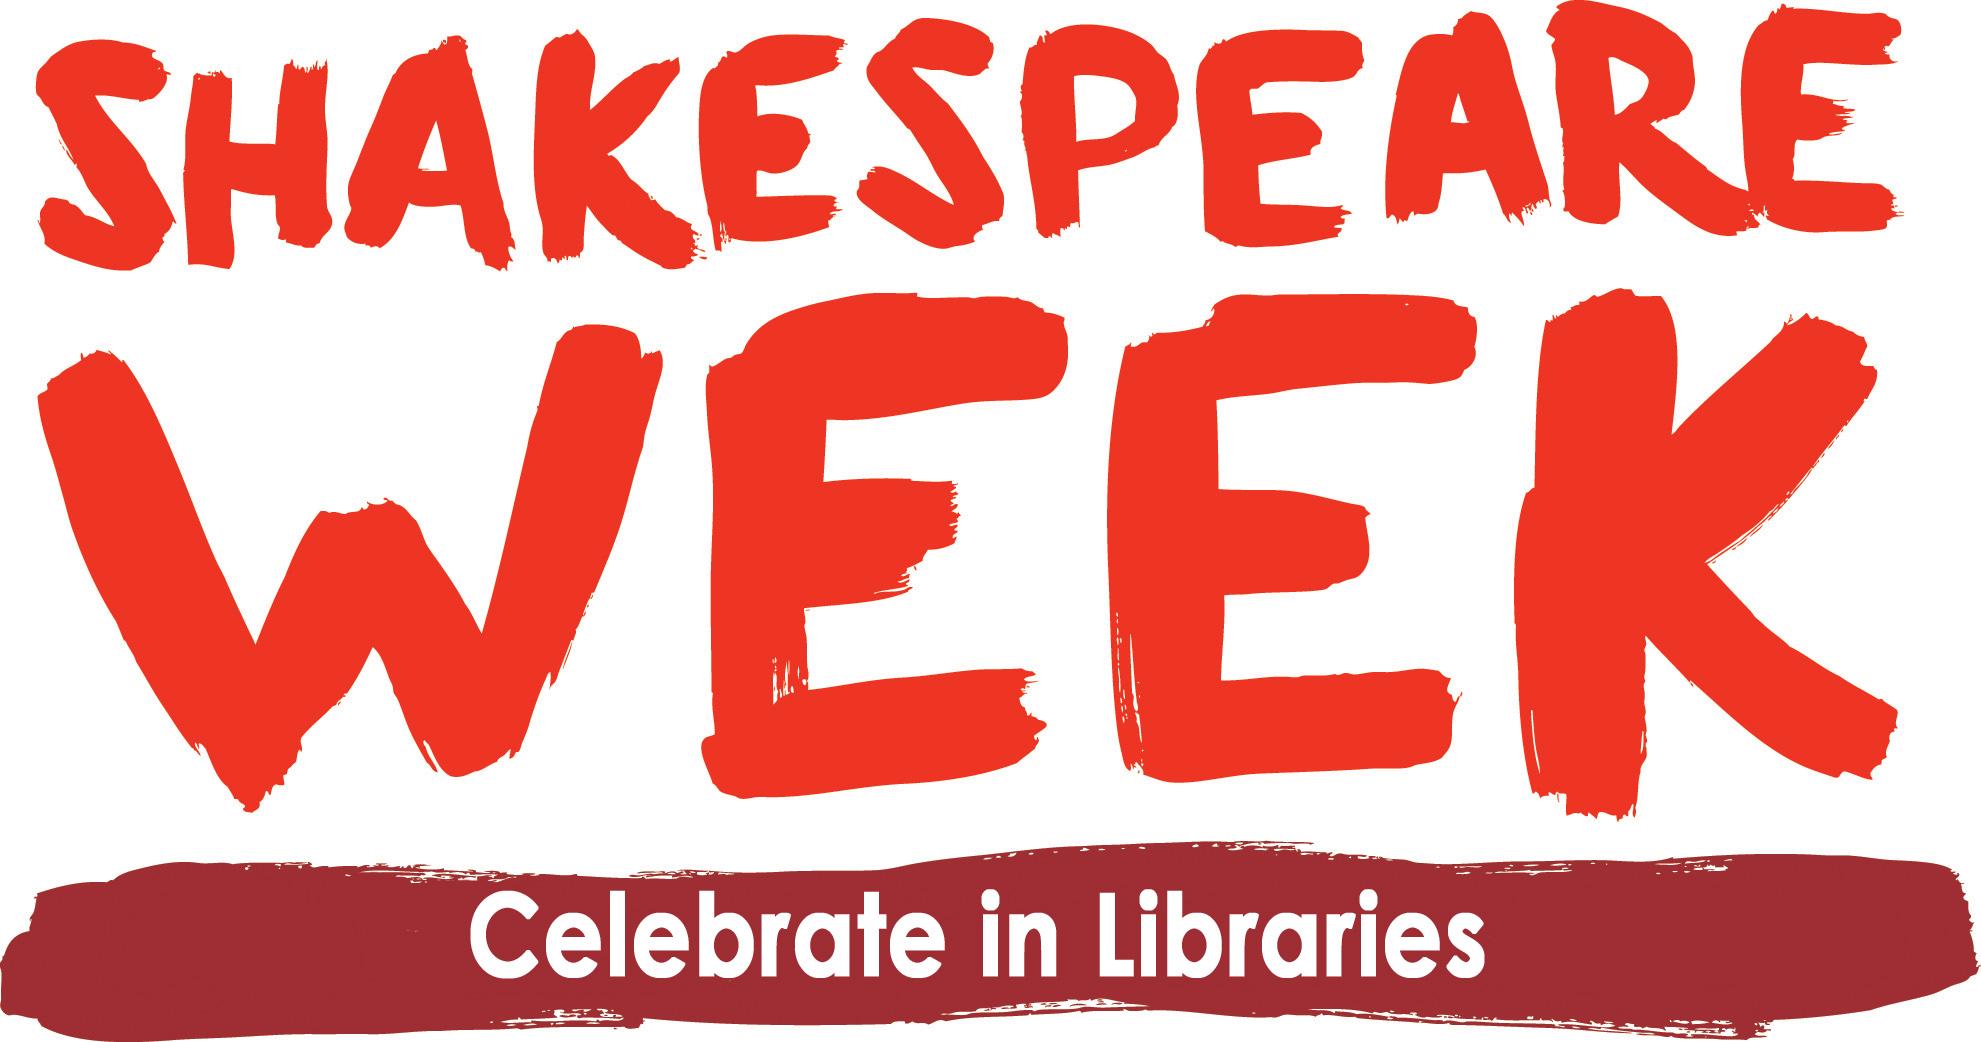 Shakespeare week logo libraries